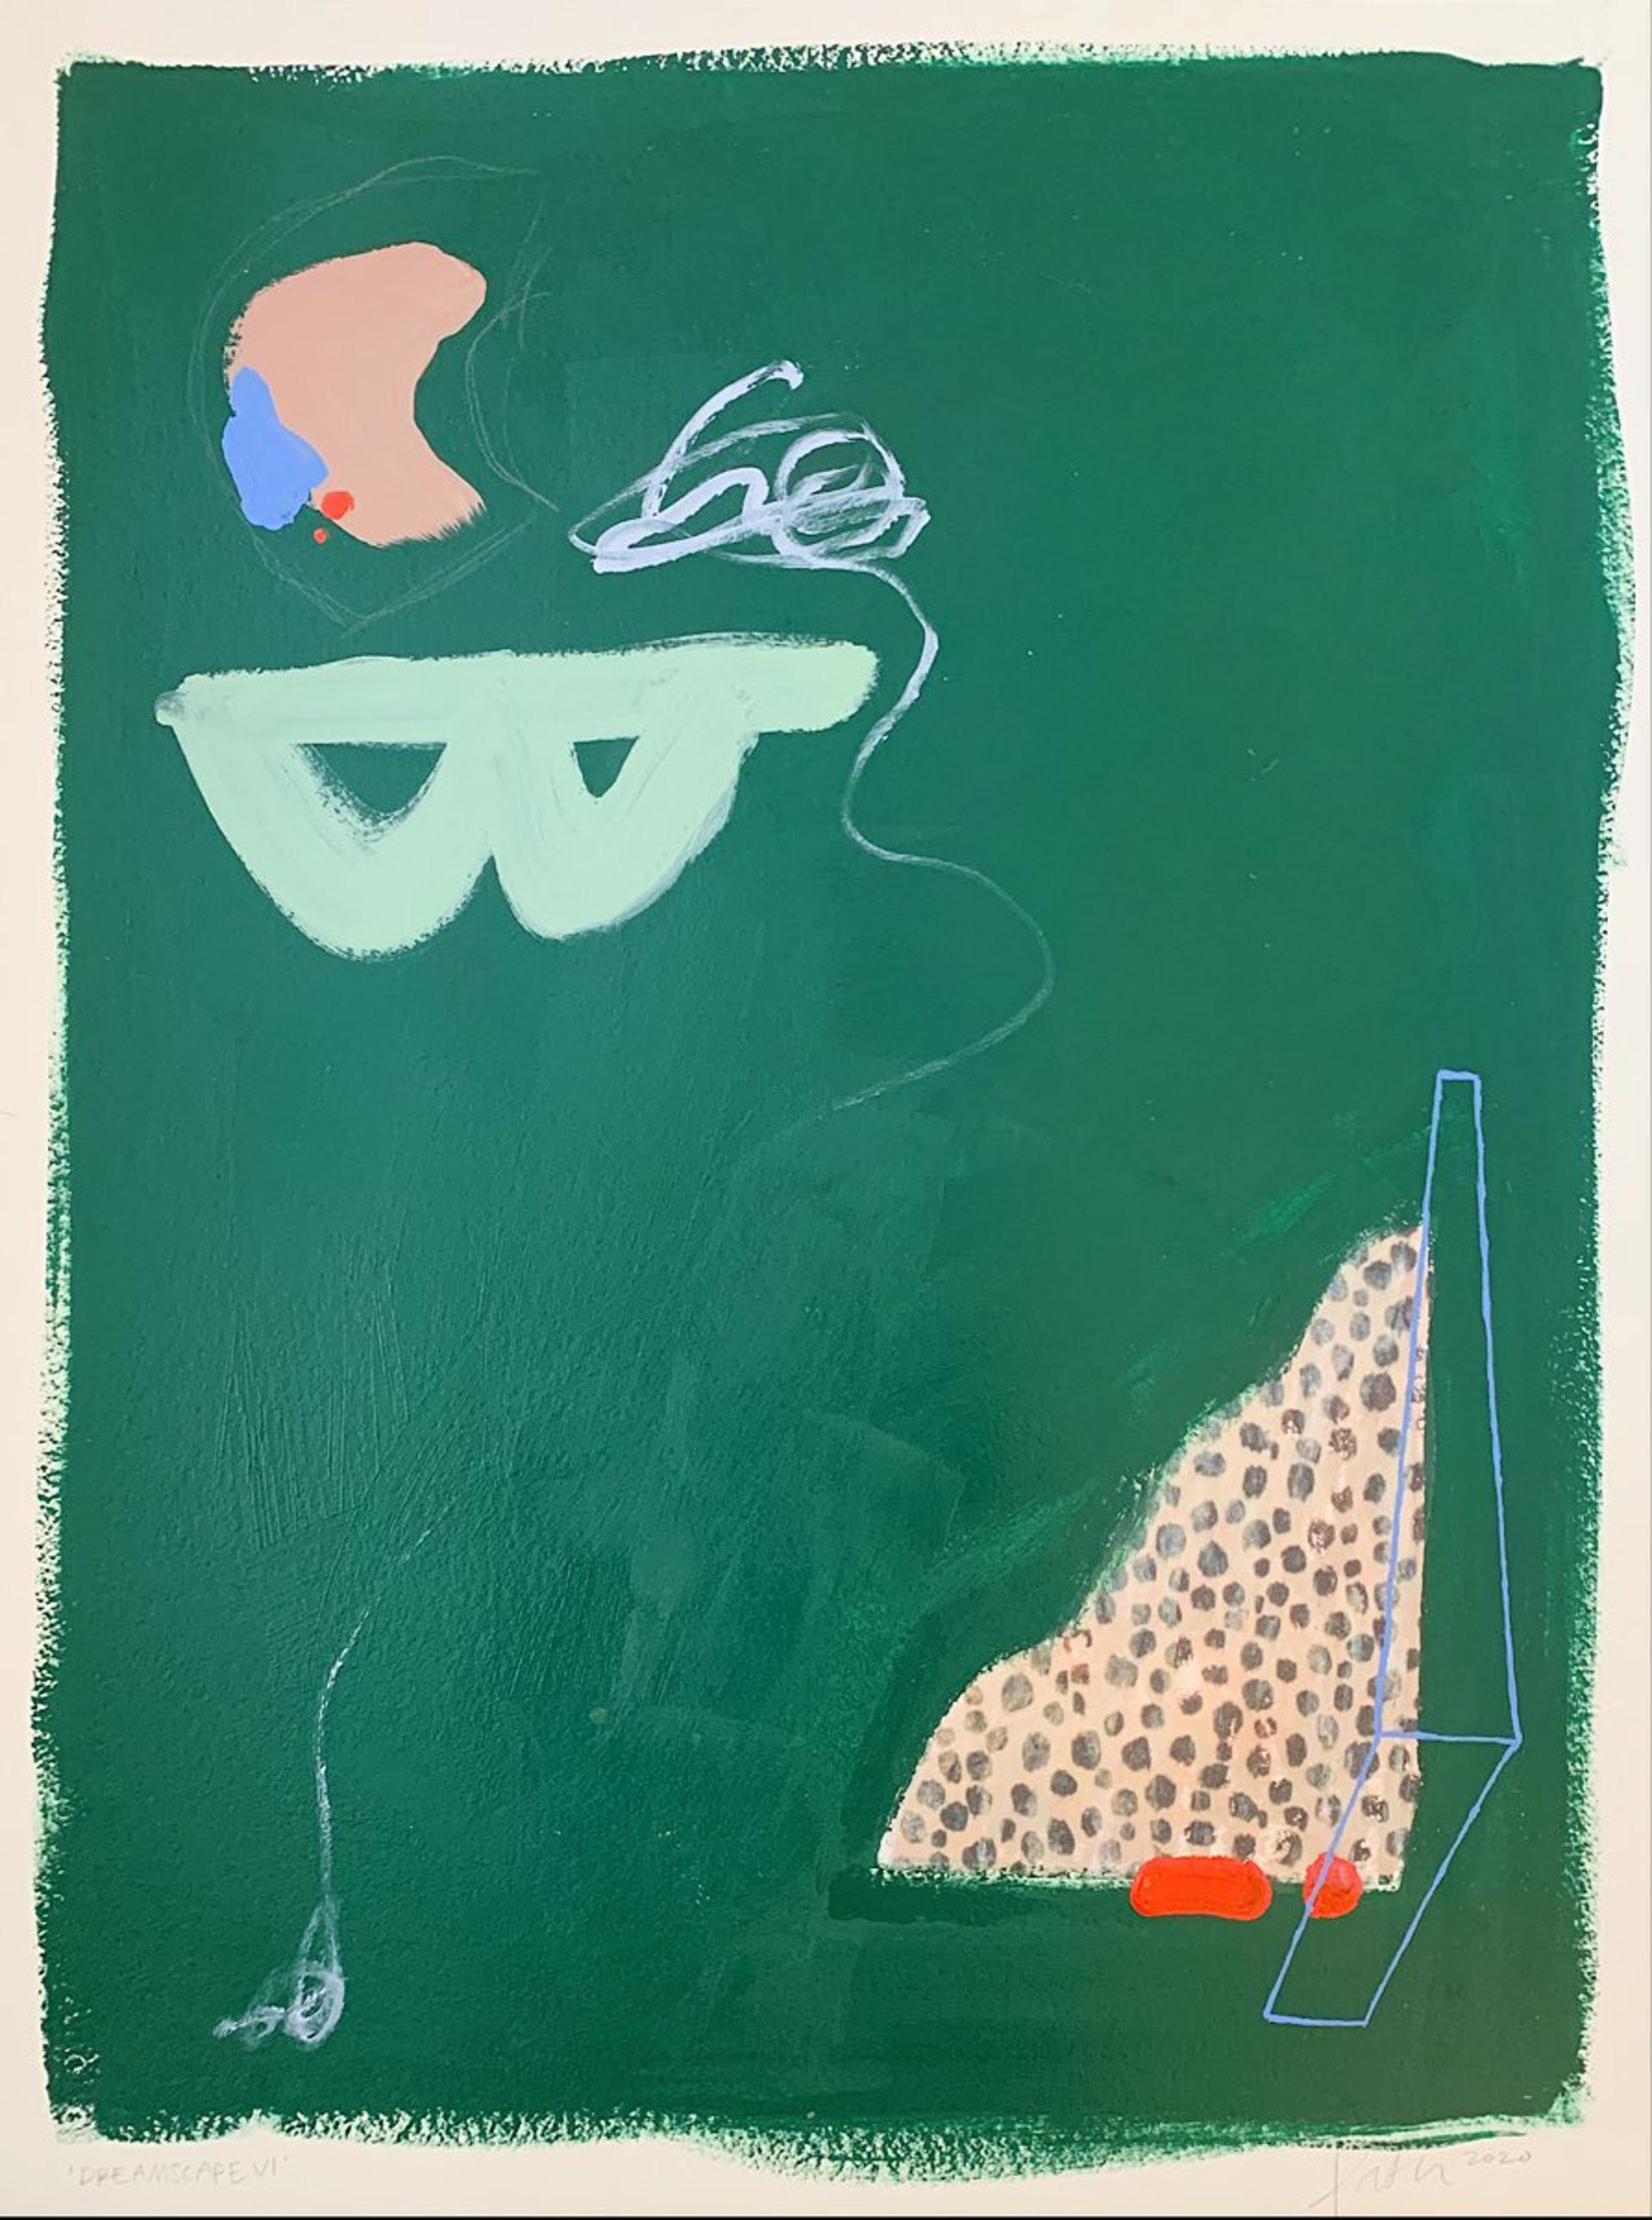 Dreamscape VI by Kathleen Jones